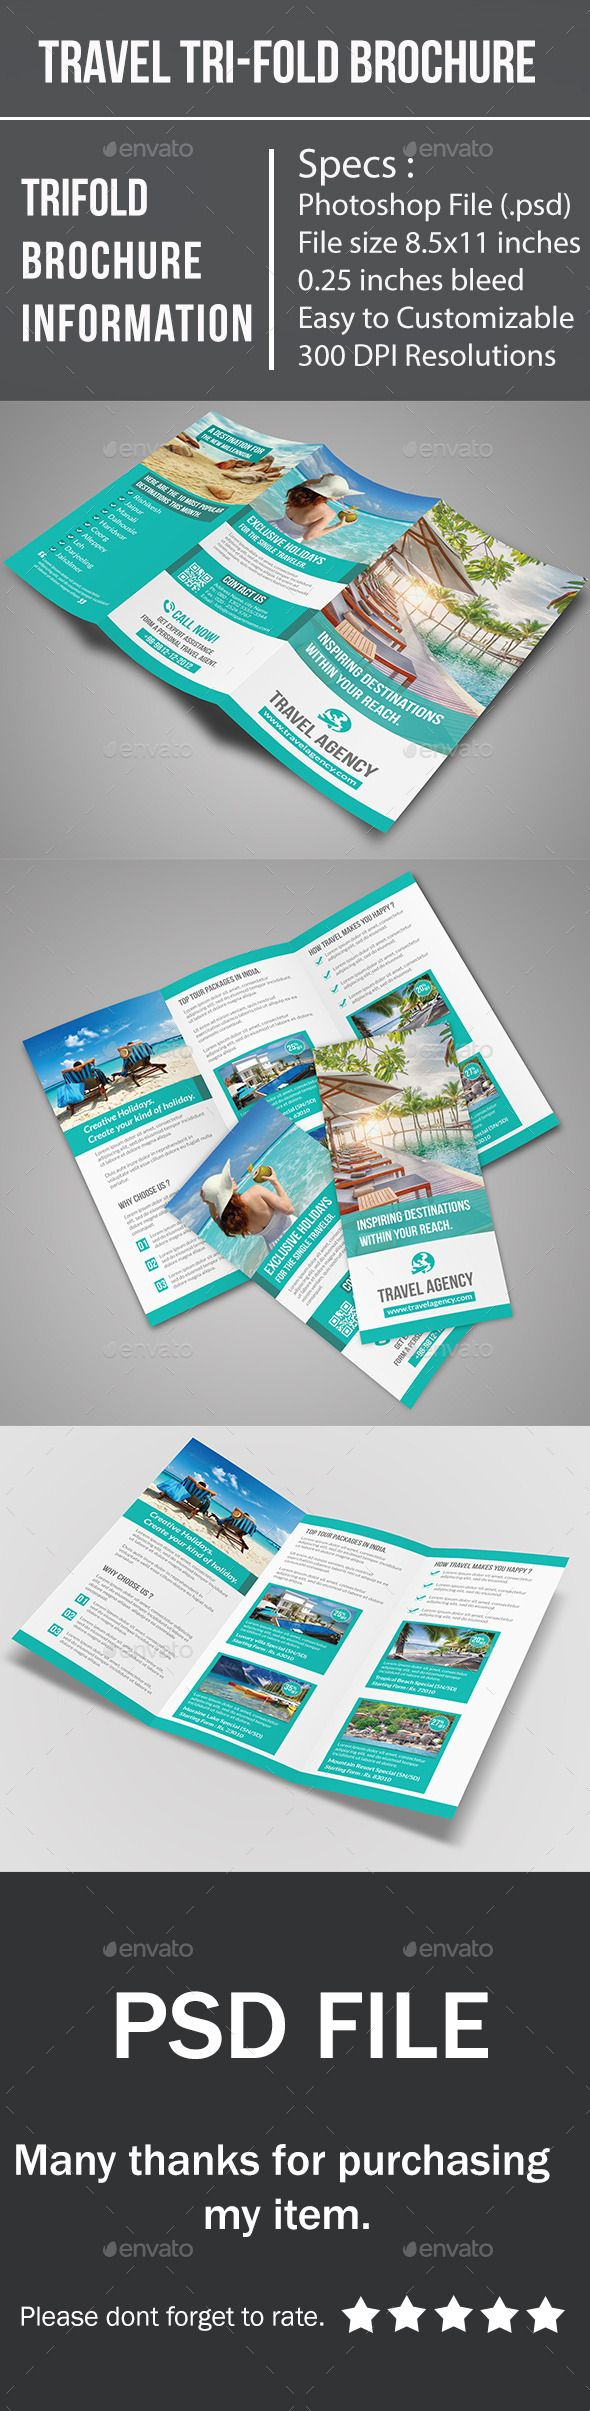 Travel Tri-Fold Brochure | Brochures, Tri fold brochure and Tri fold